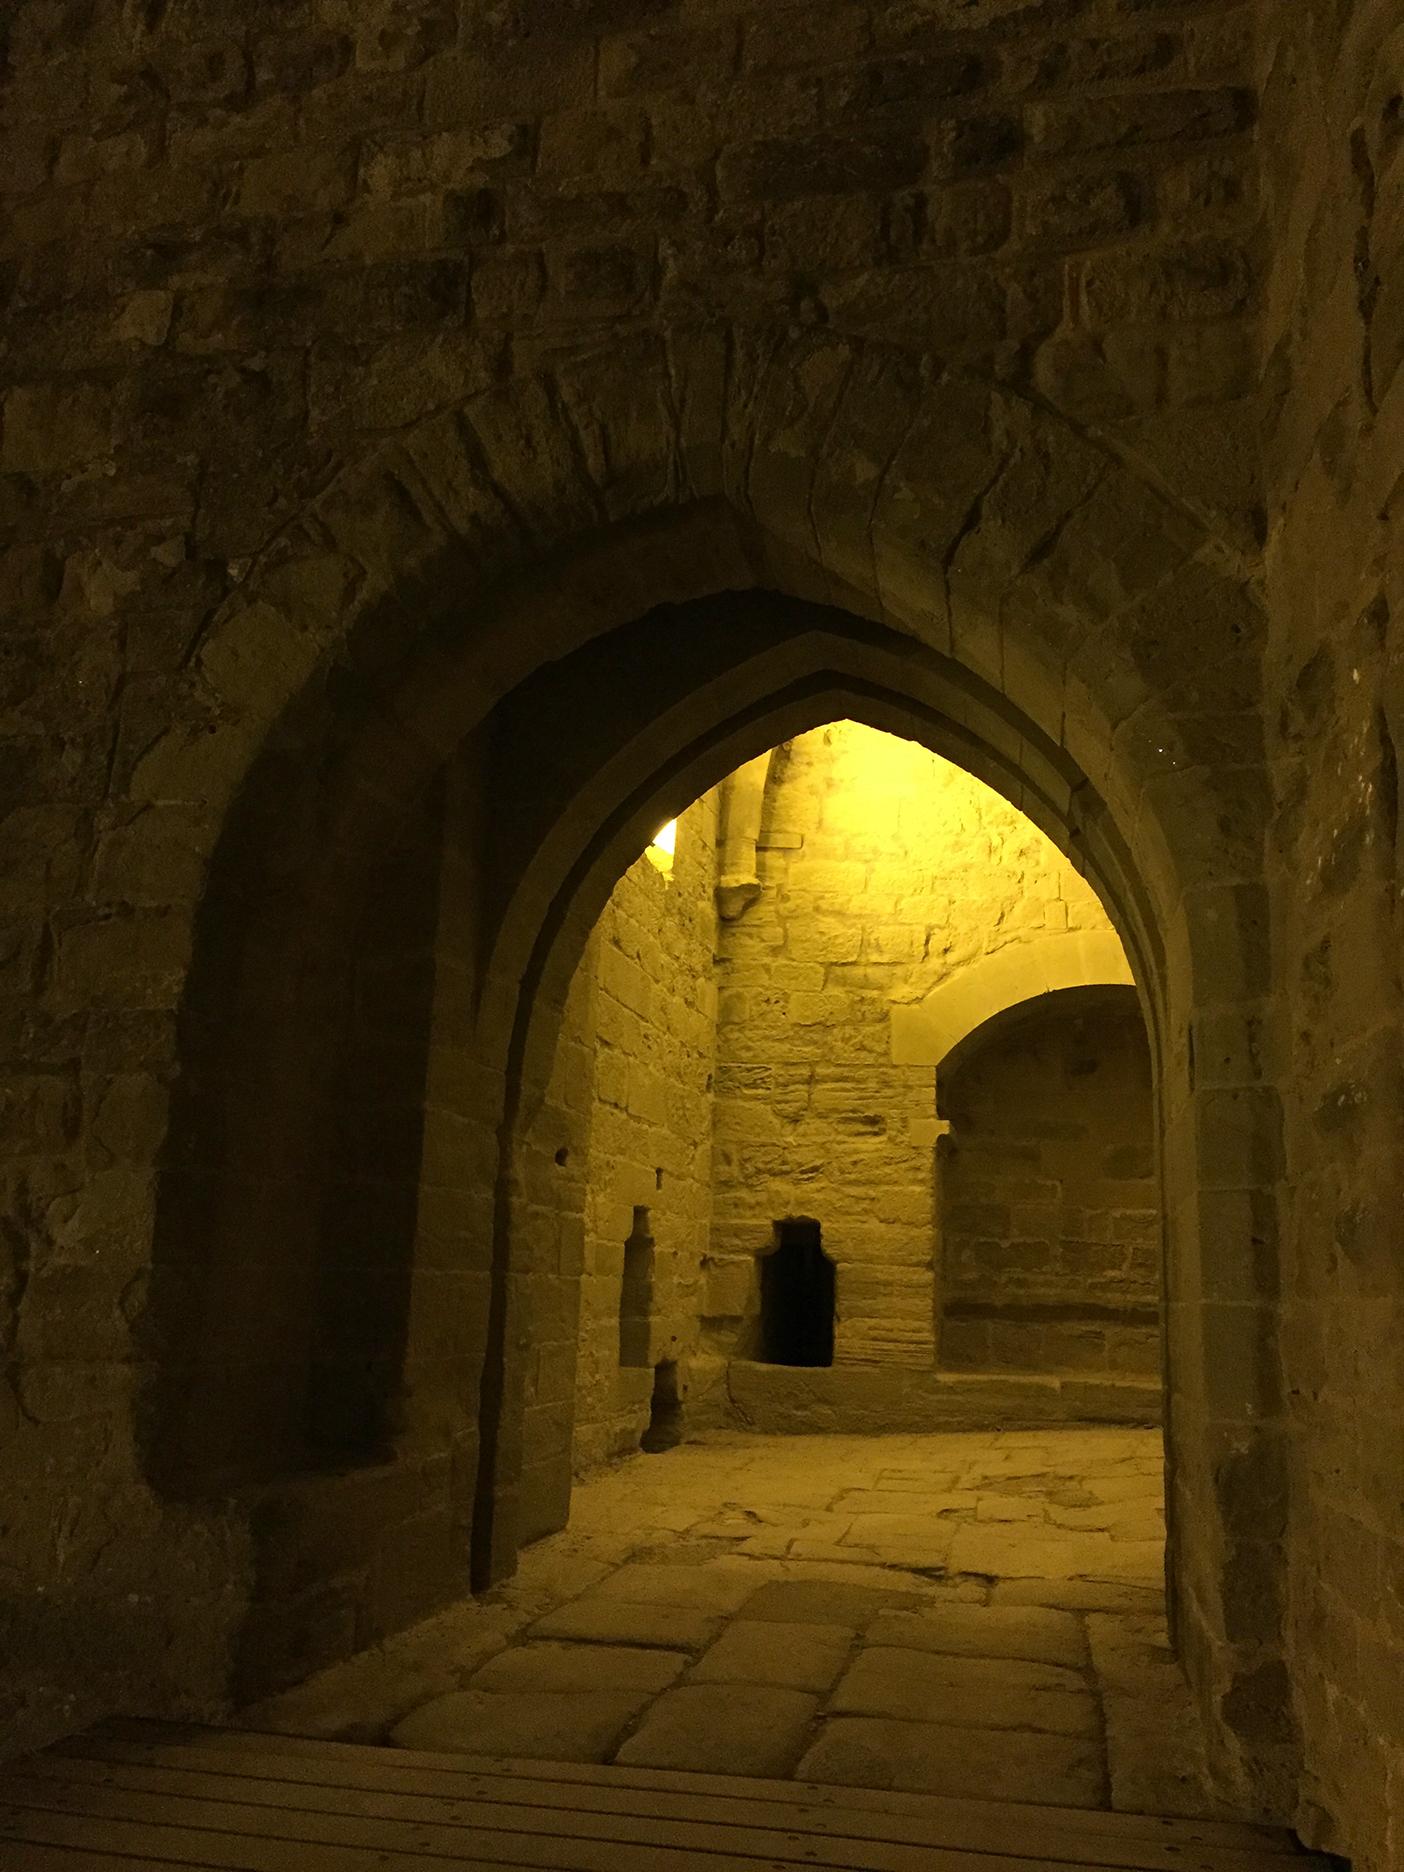 Peeking into Porte Saint Nazaire